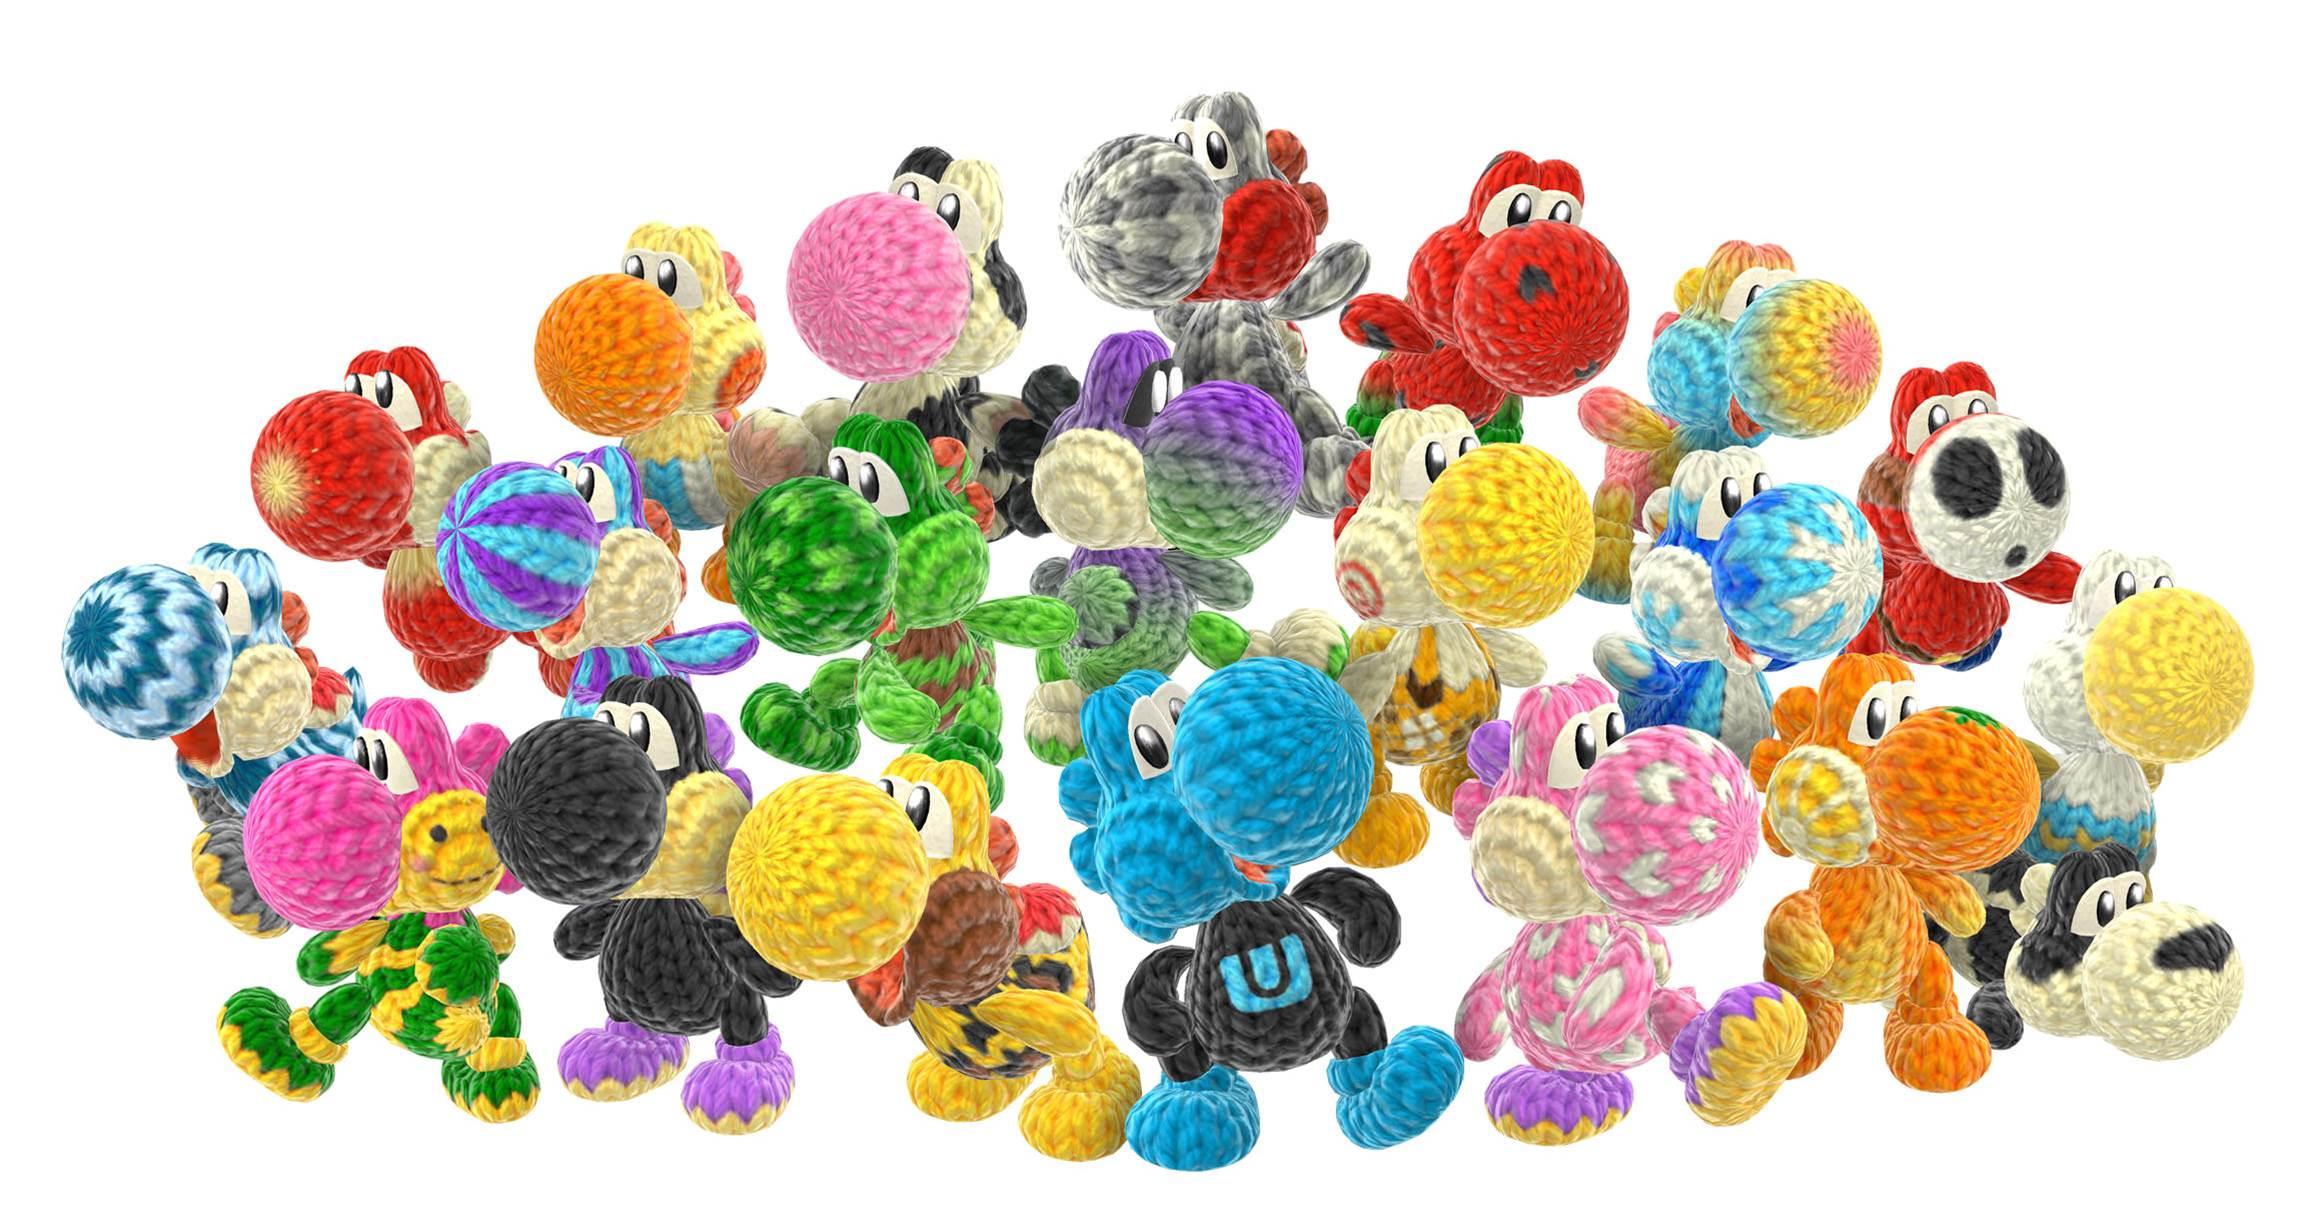 Yoshi Character Design : Yoshi s woolly world review my nintendo news